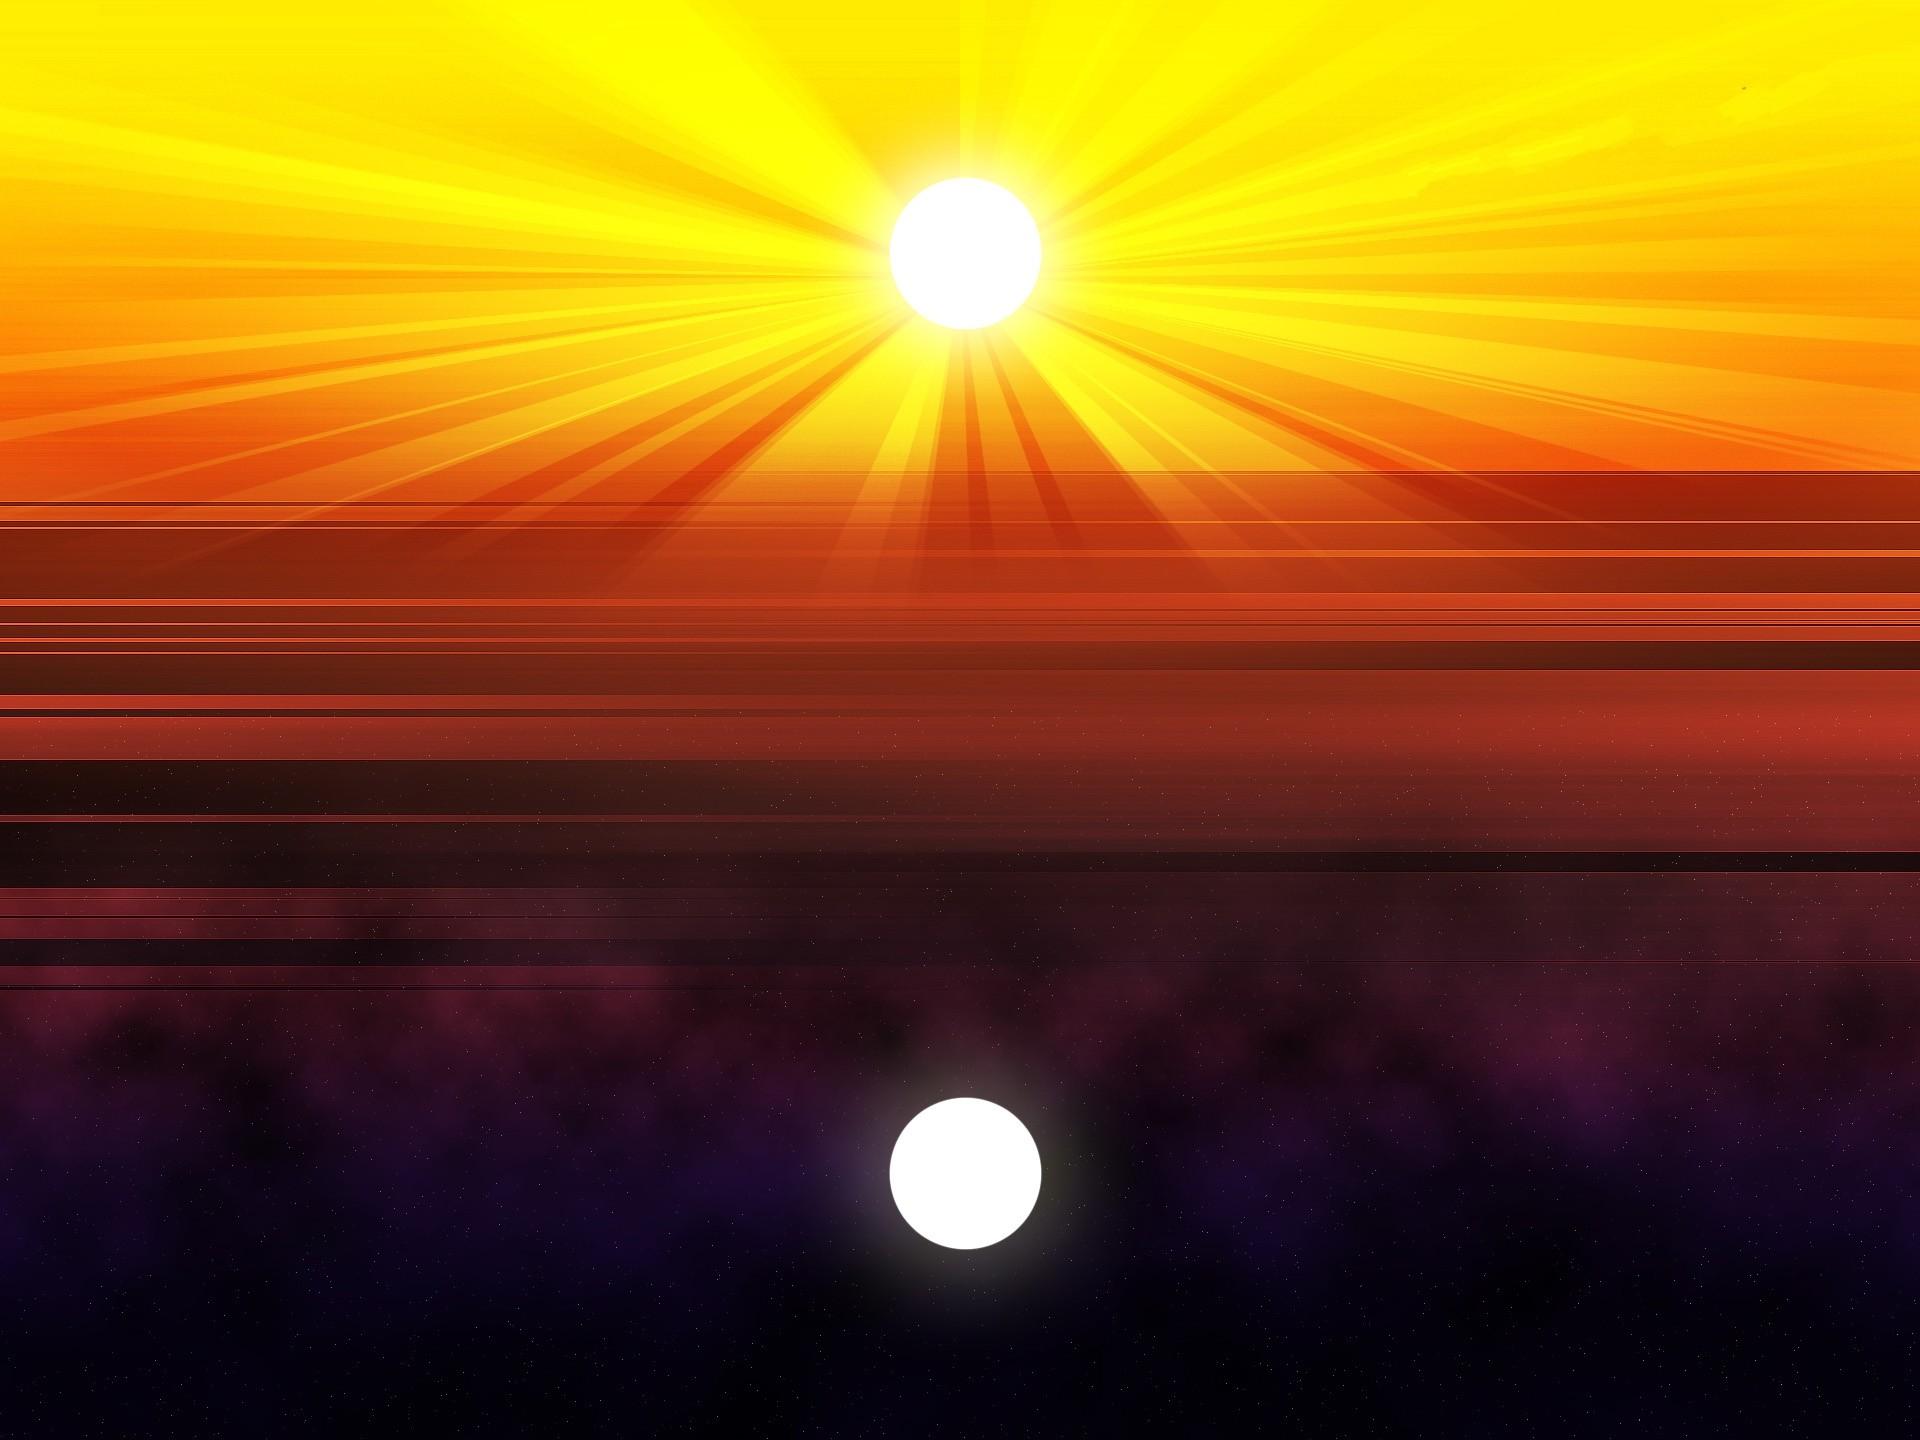 Sun Moon Stars Desktop Image. HD Sun Moon Stars Image. Full HD Sun .